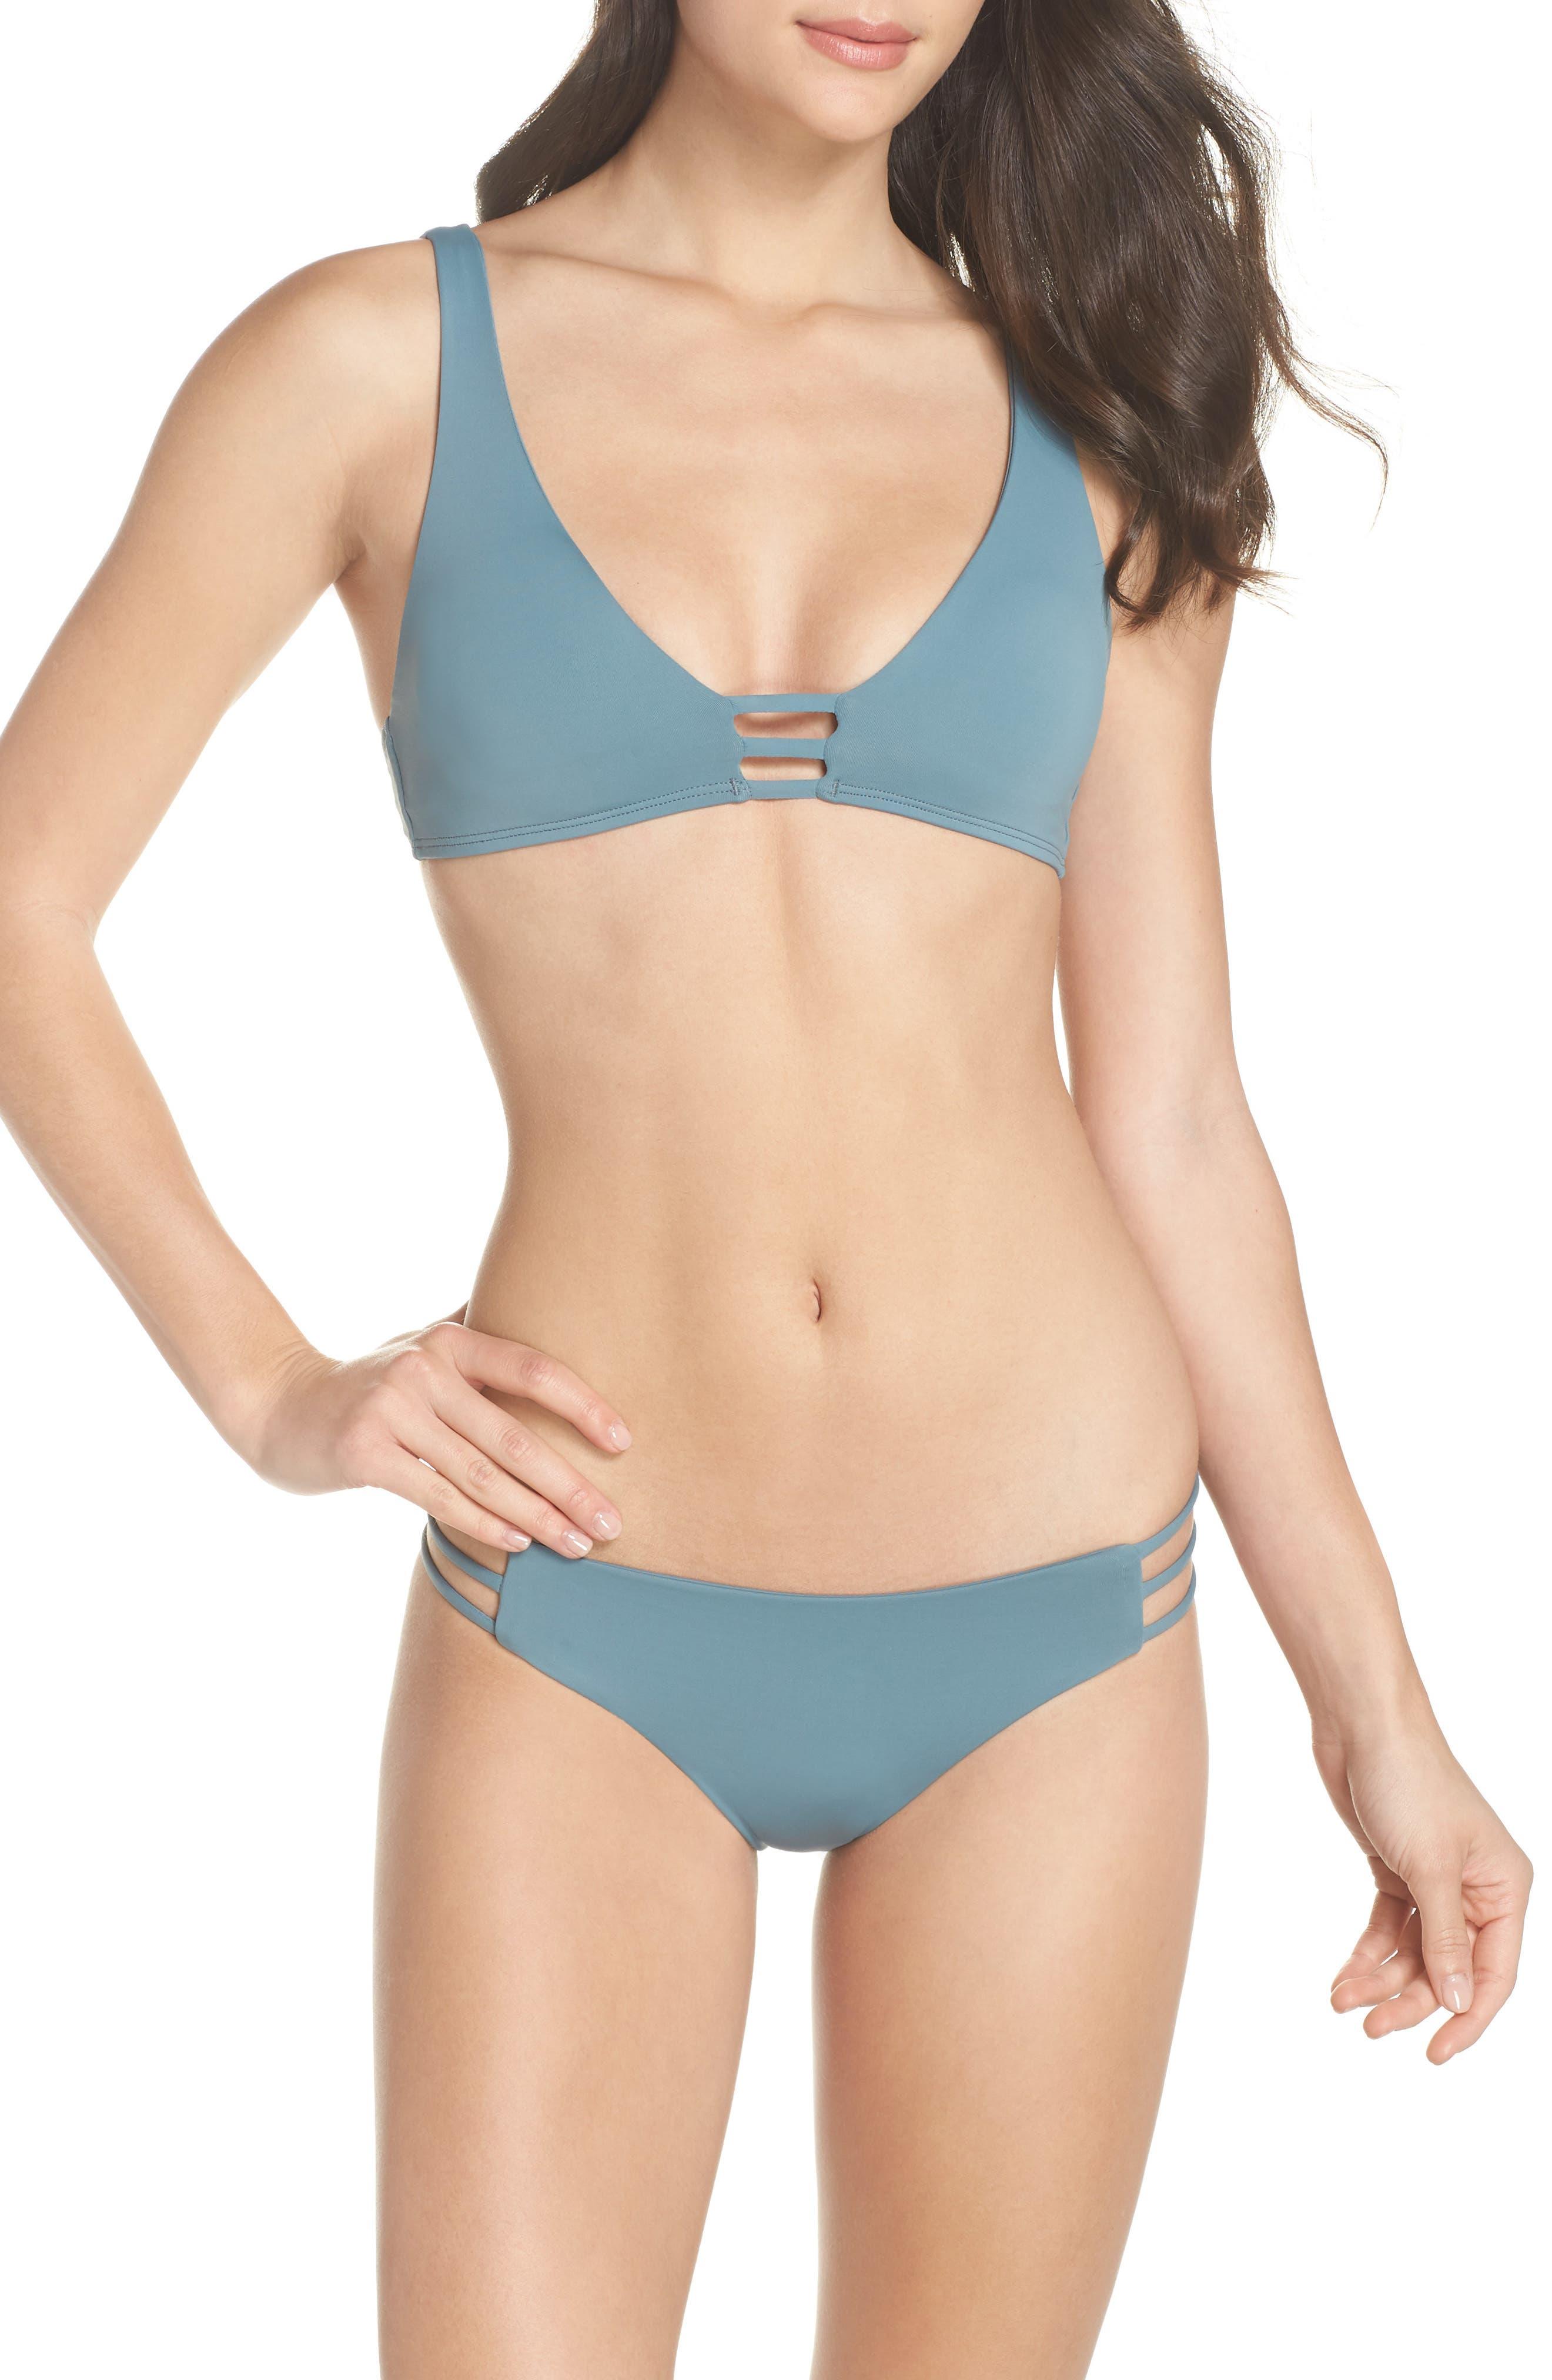 Monroe Bikini Top,                             Alternate thumbnail 7, color,                             SLATED GLASS